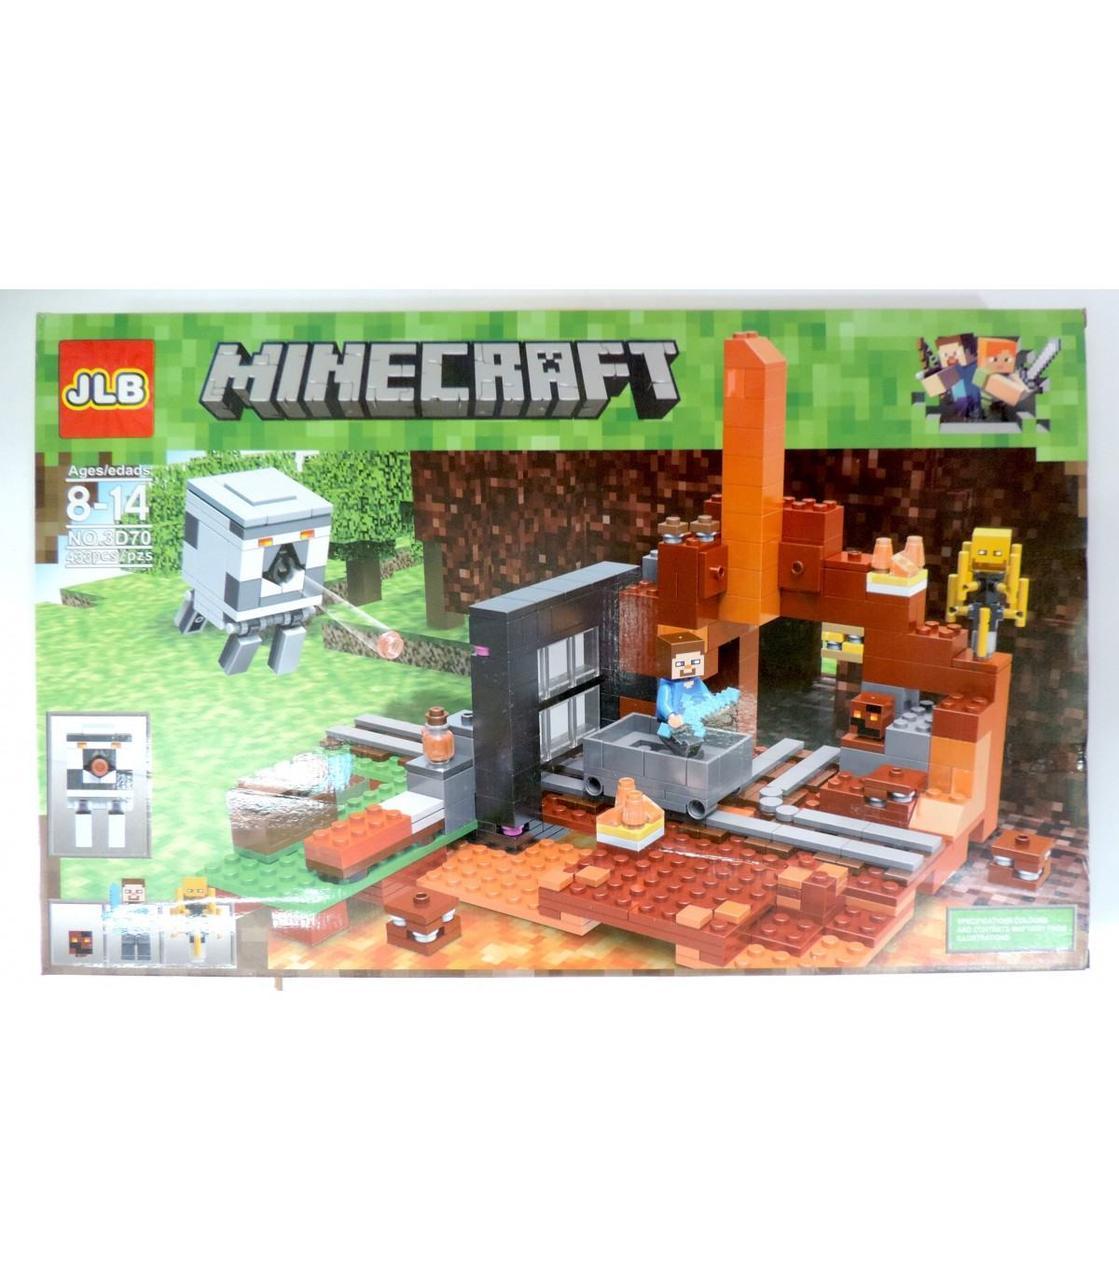 "Великий конструктор Майнкрафт JLB Minecraft ""Будівництво"" 433 pcs GA7-21"